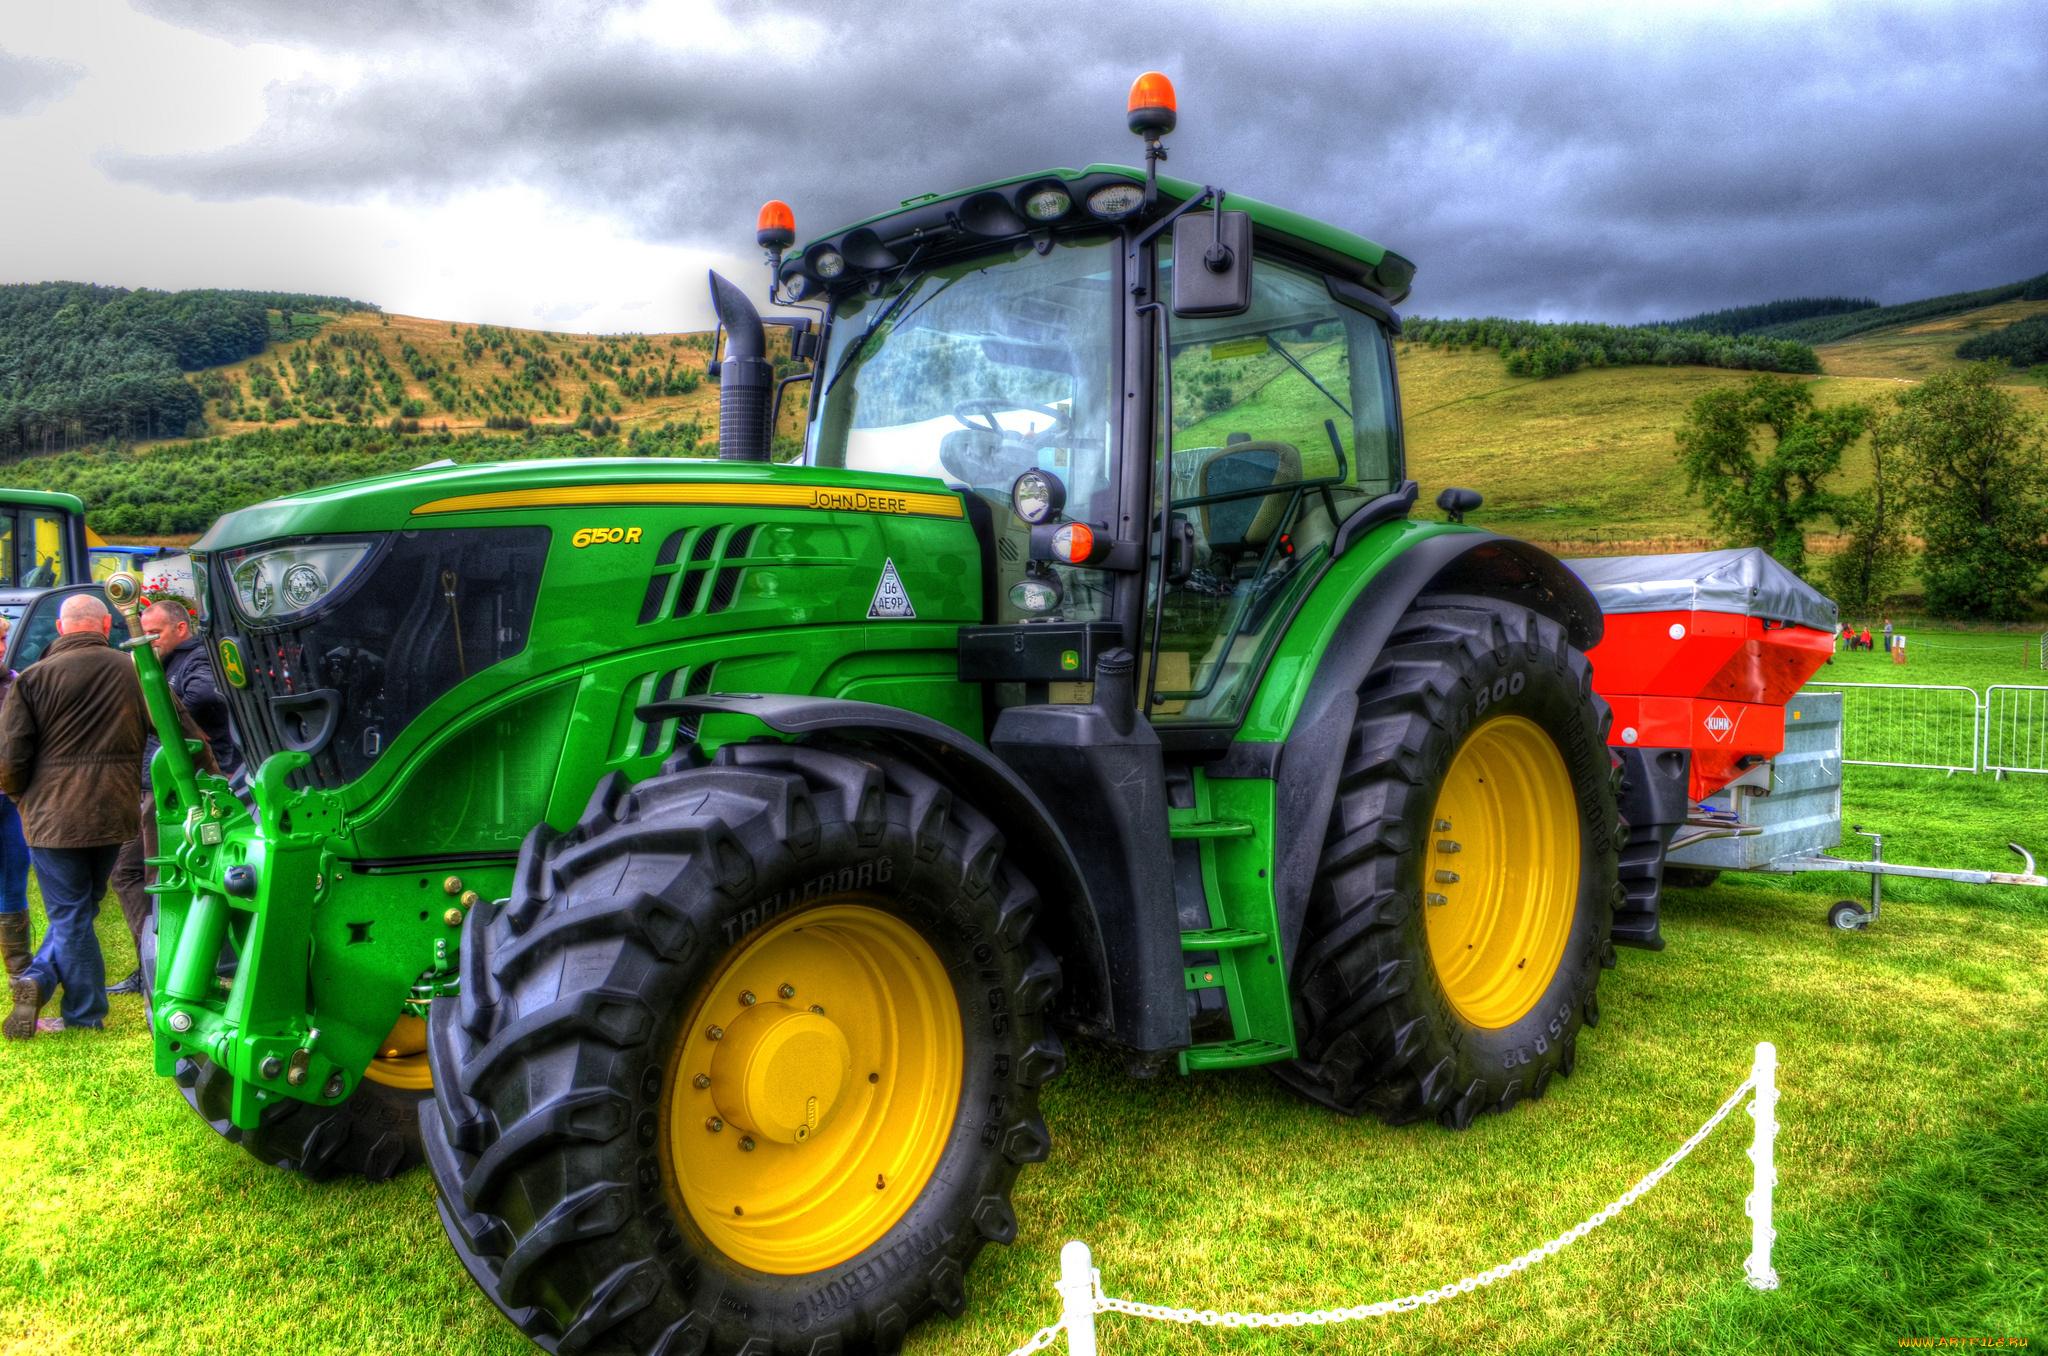 видео с тракторами